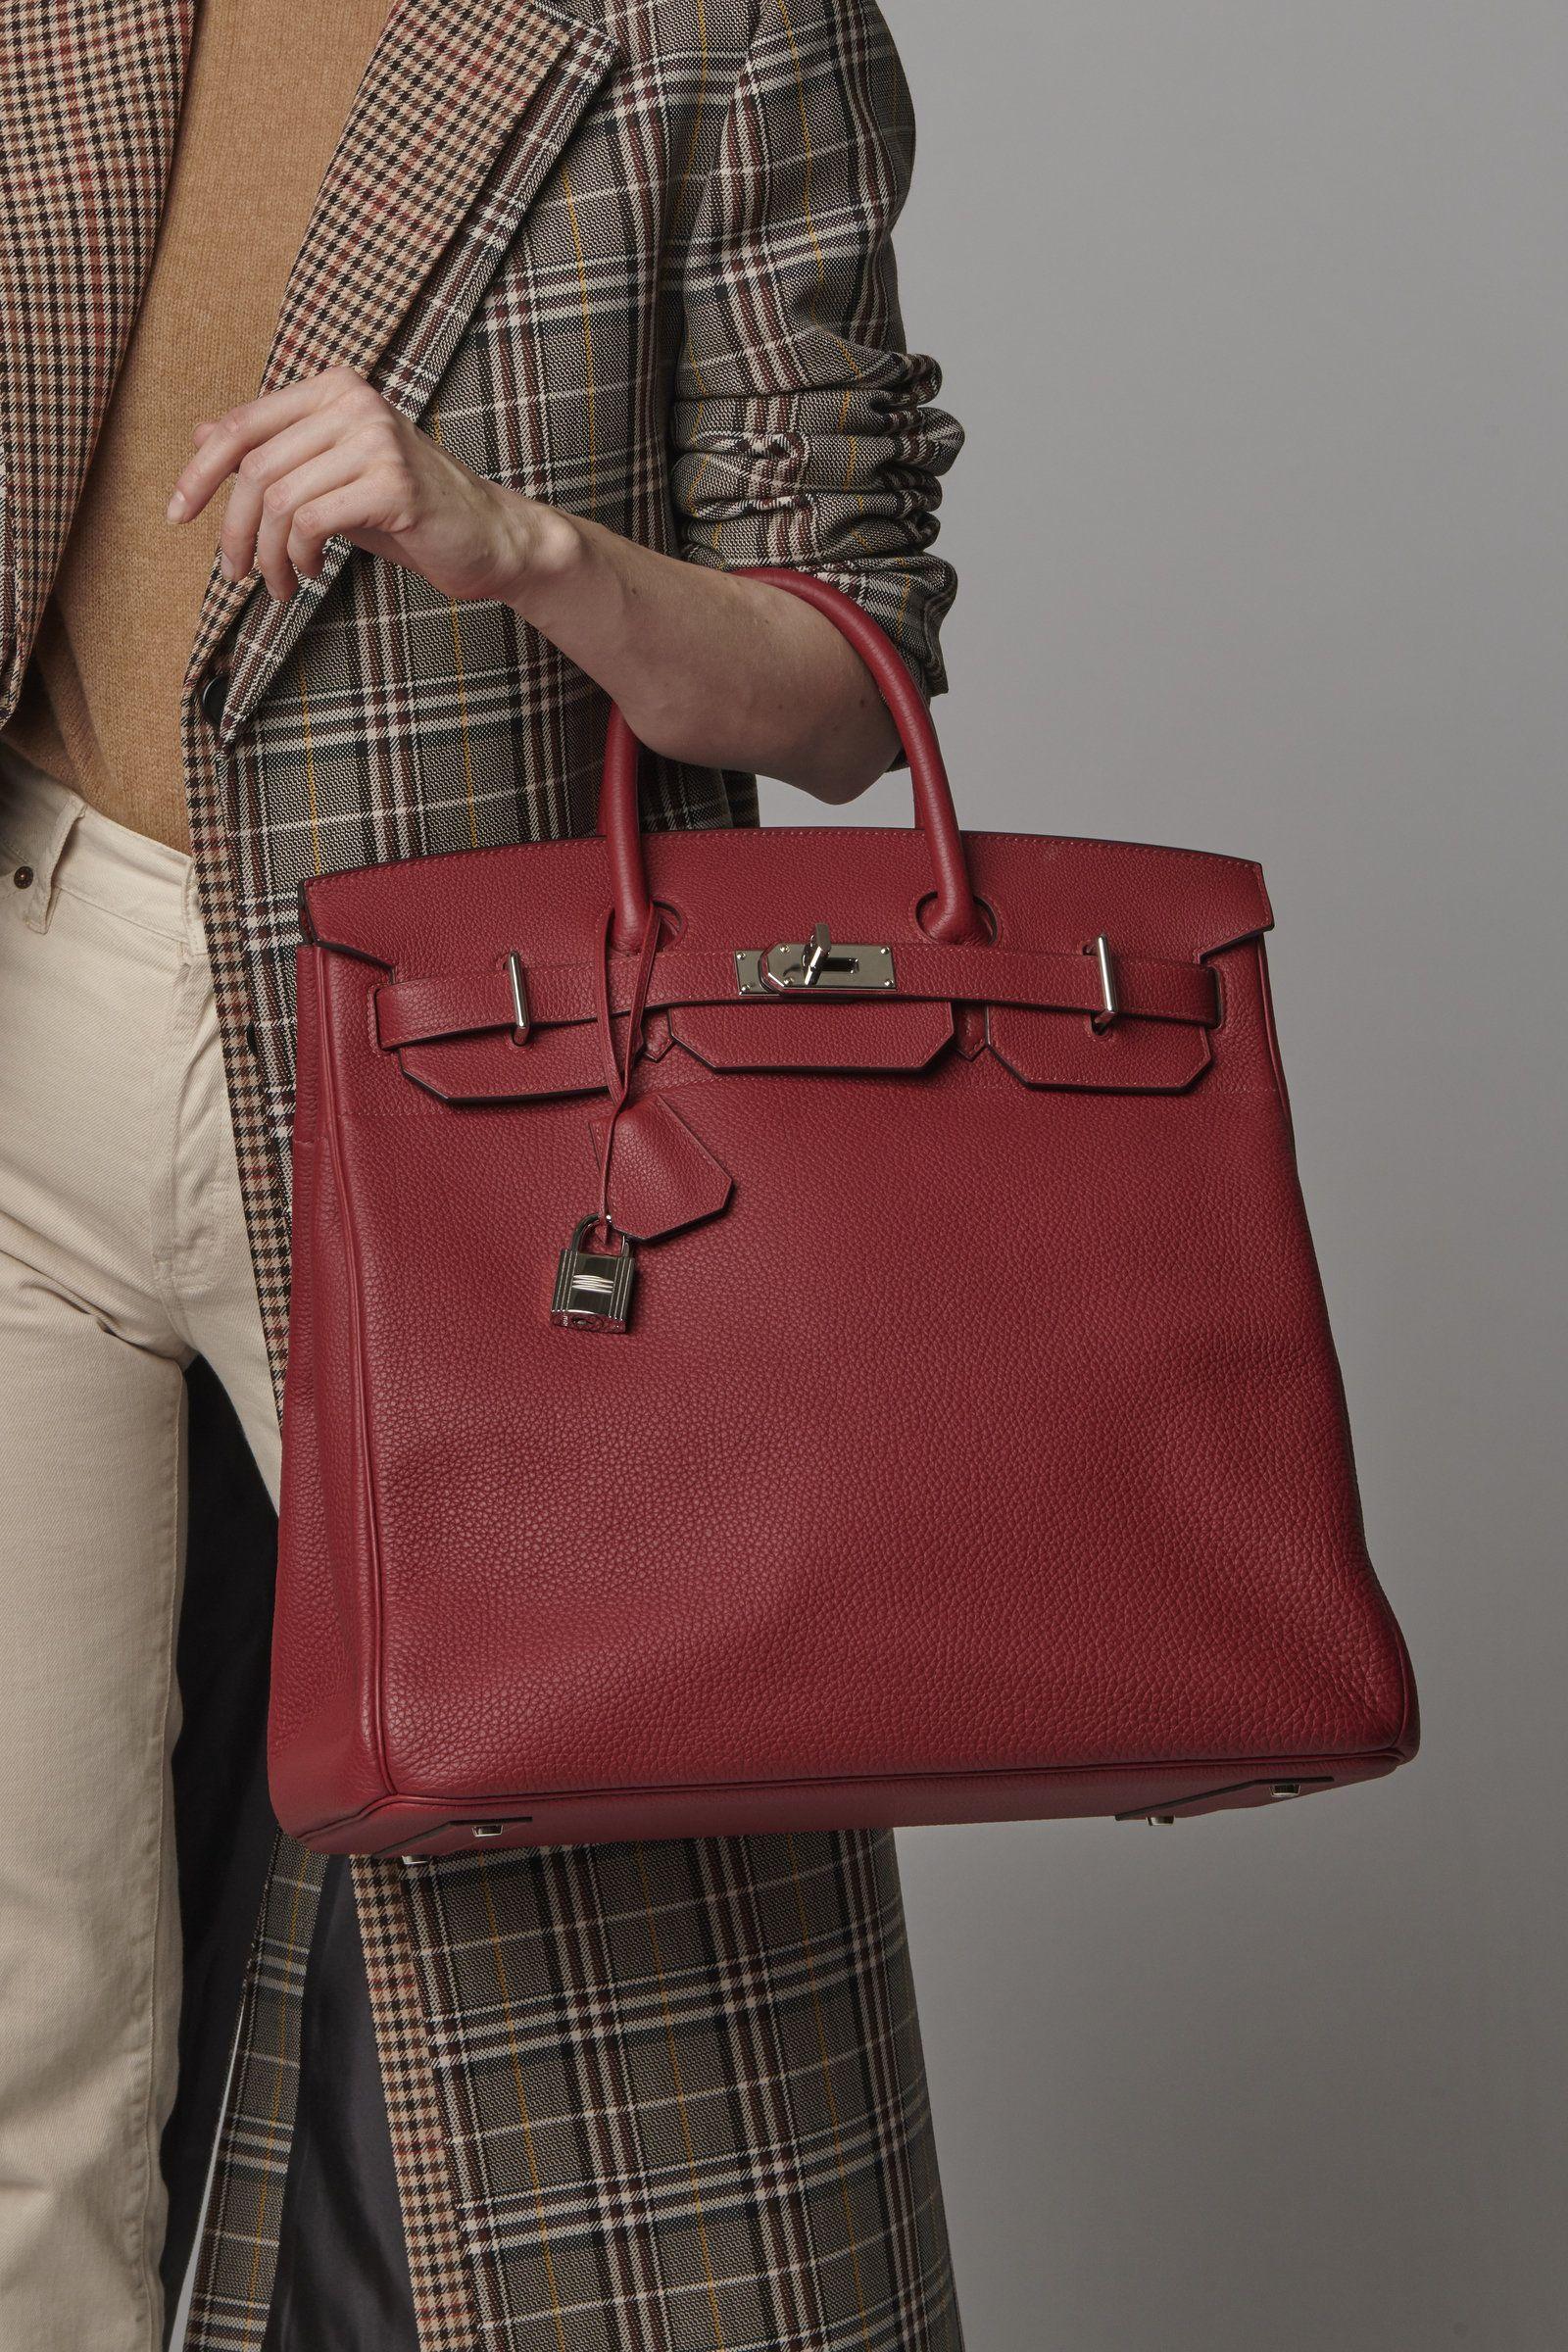 35ea82a947 Hermès 40cm Rouge Grenat Togo Leather HAC  Birkin